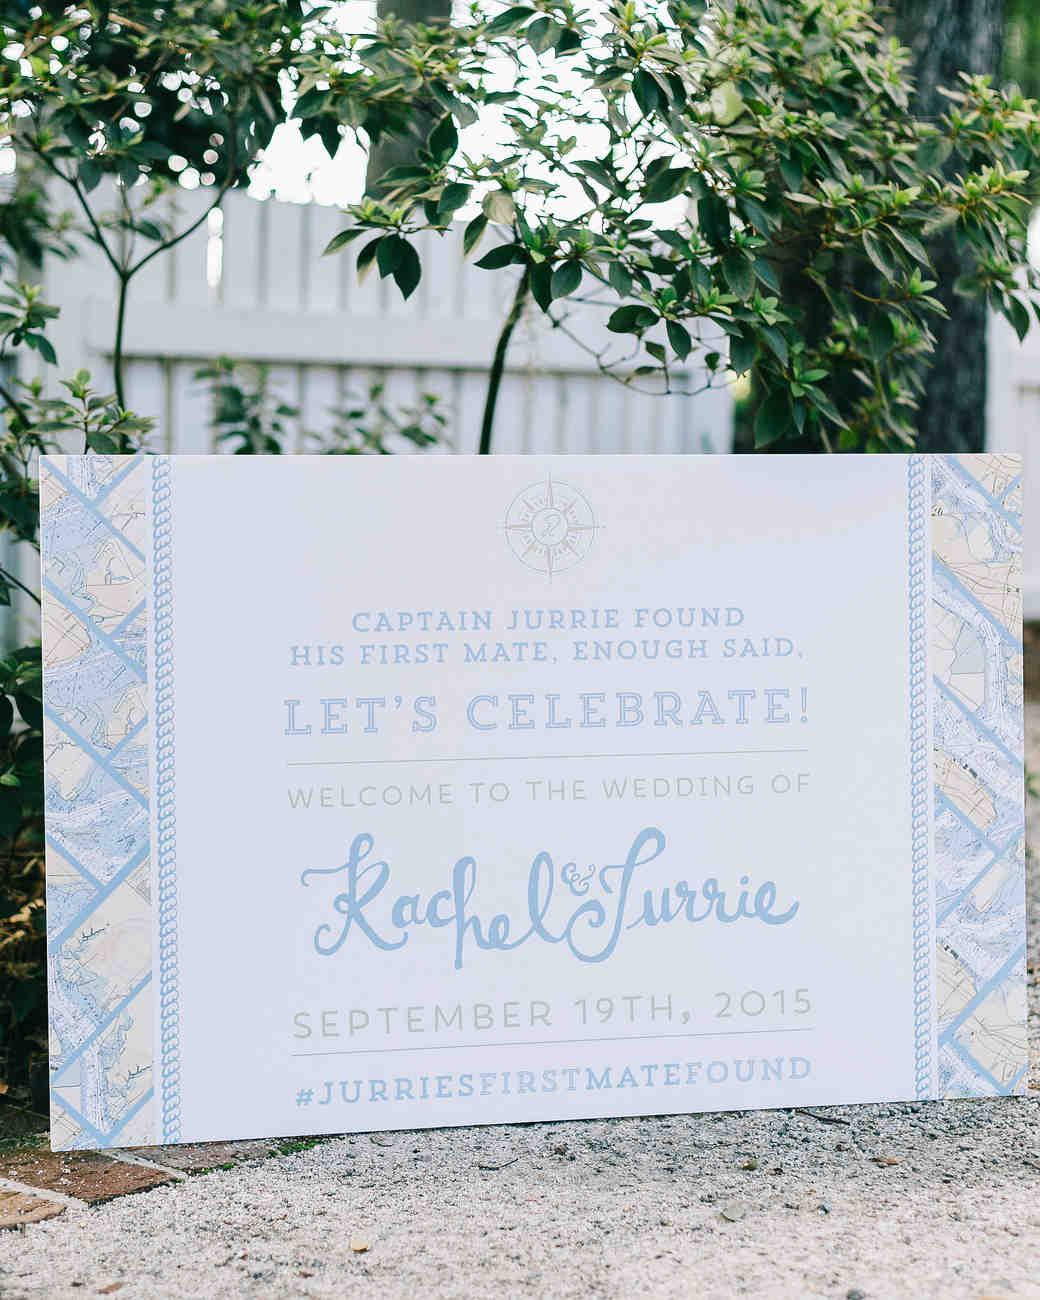 rachel-jurrie-nautical-wedding-welcomesign-0165-s112778-0416.jpg